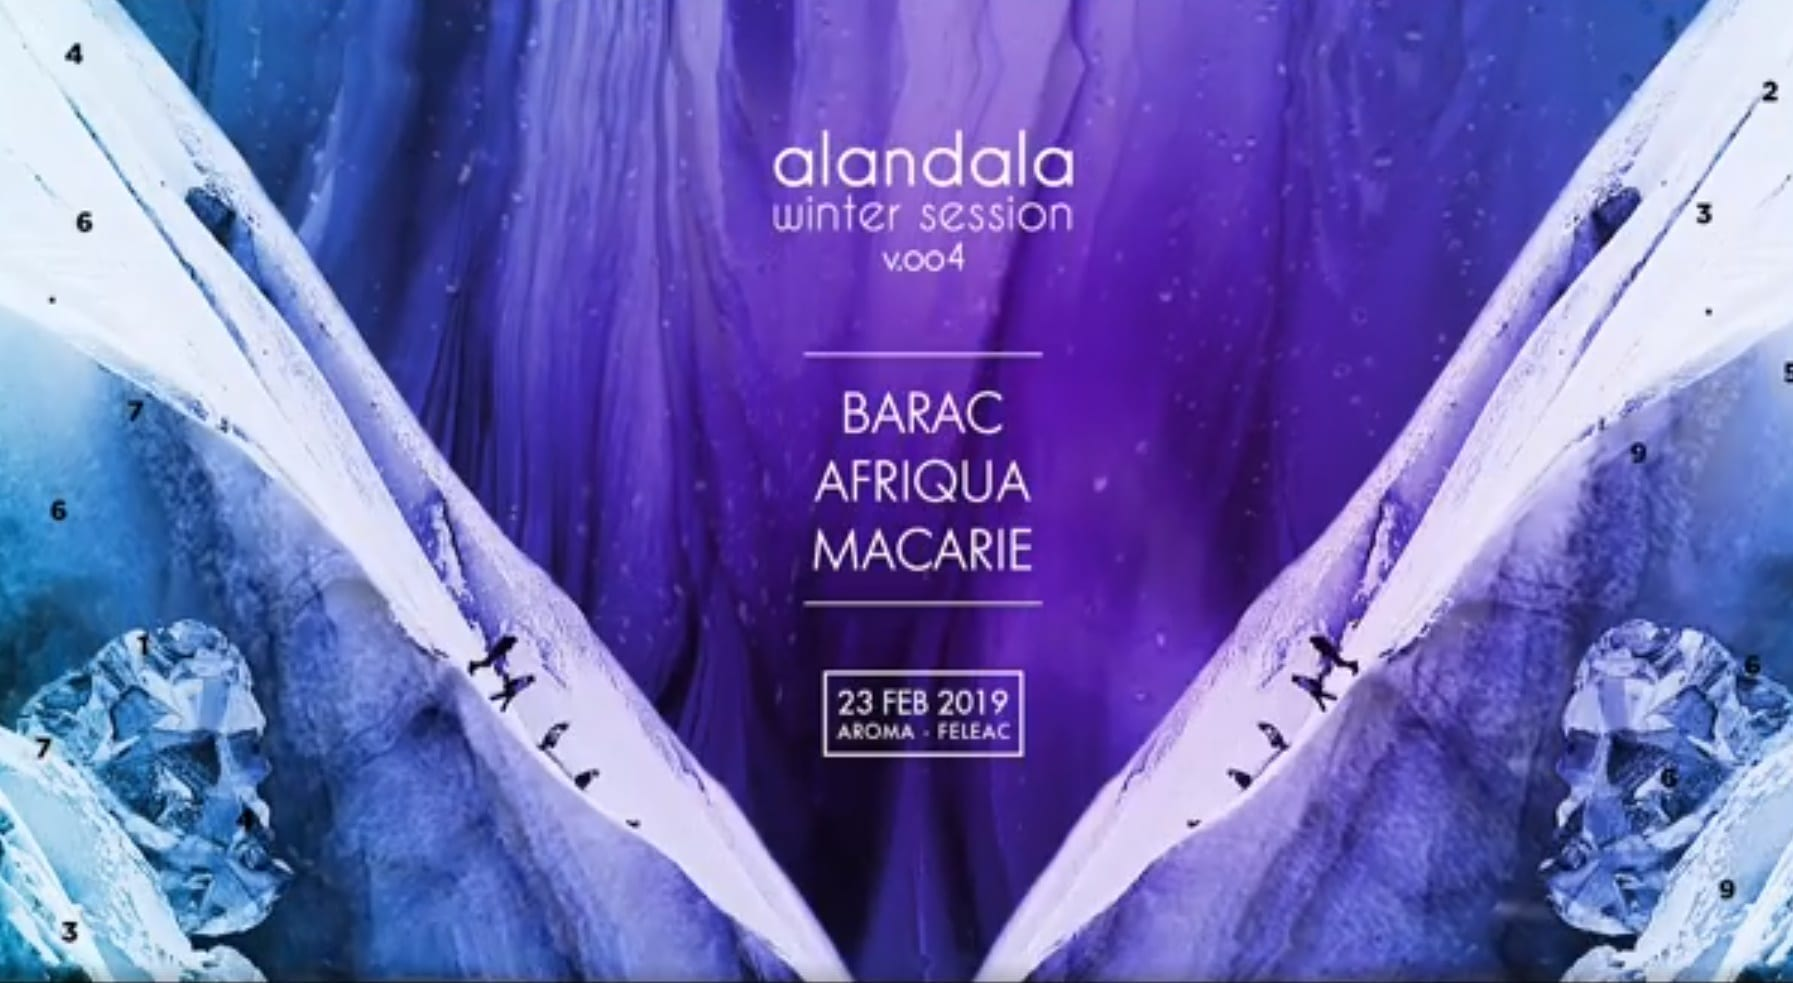 Alandala winter session - v.oo4 [urban_edition]